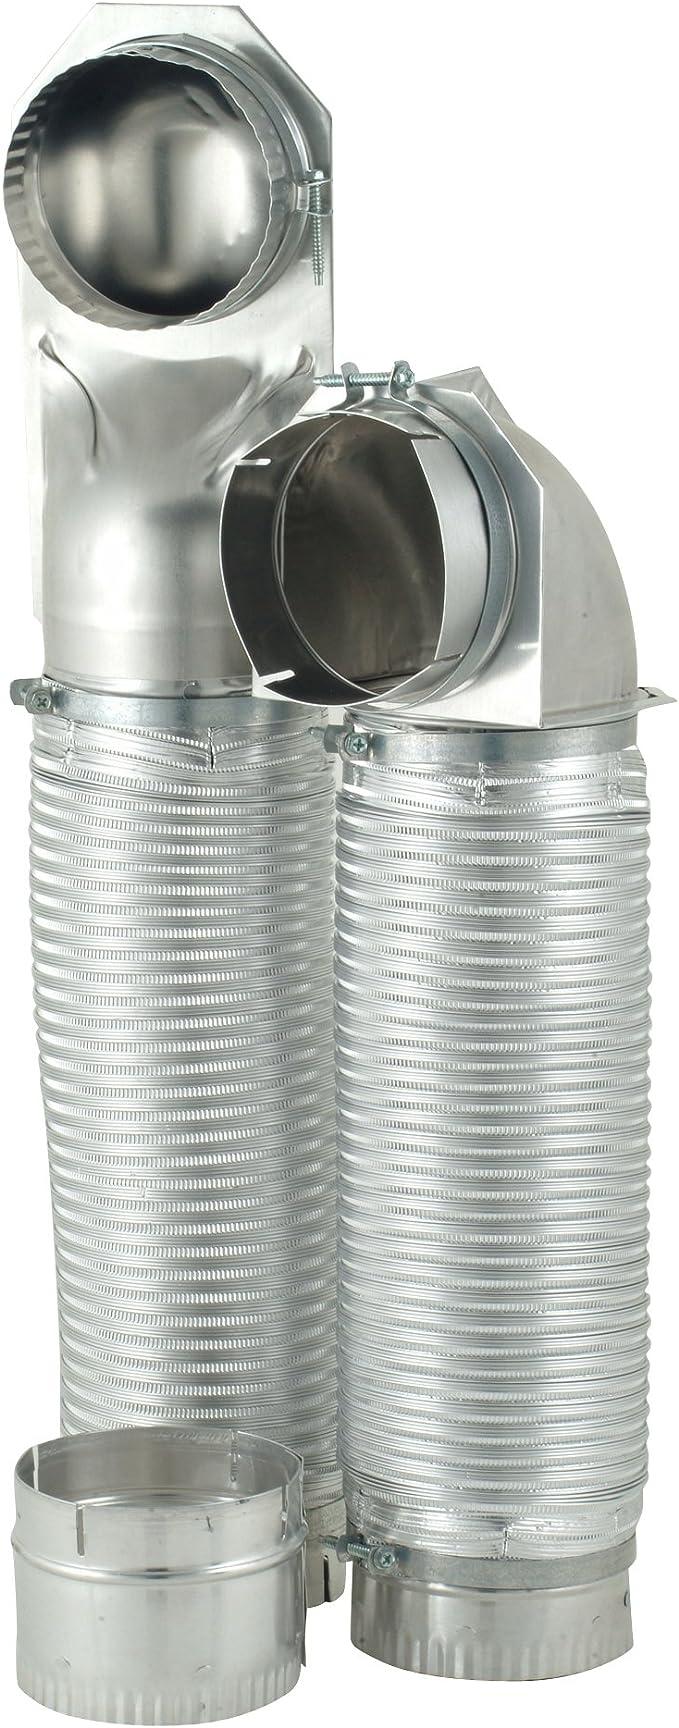 Renewed Whirlpool 4396013RB Dura Vent Installer Kit for Dryers